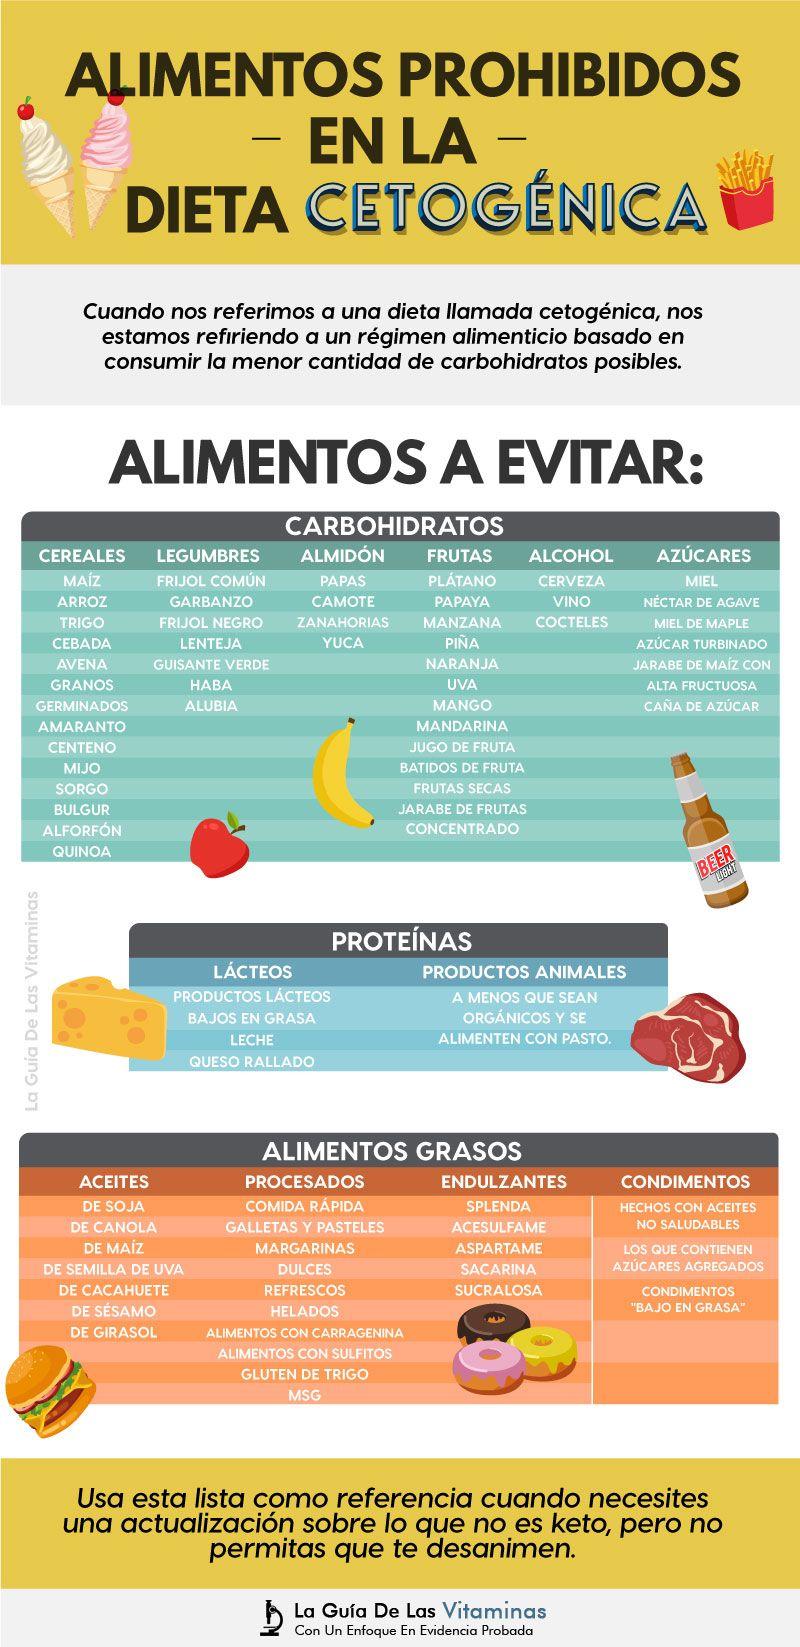 Alimentos prohibidos en dieta keto